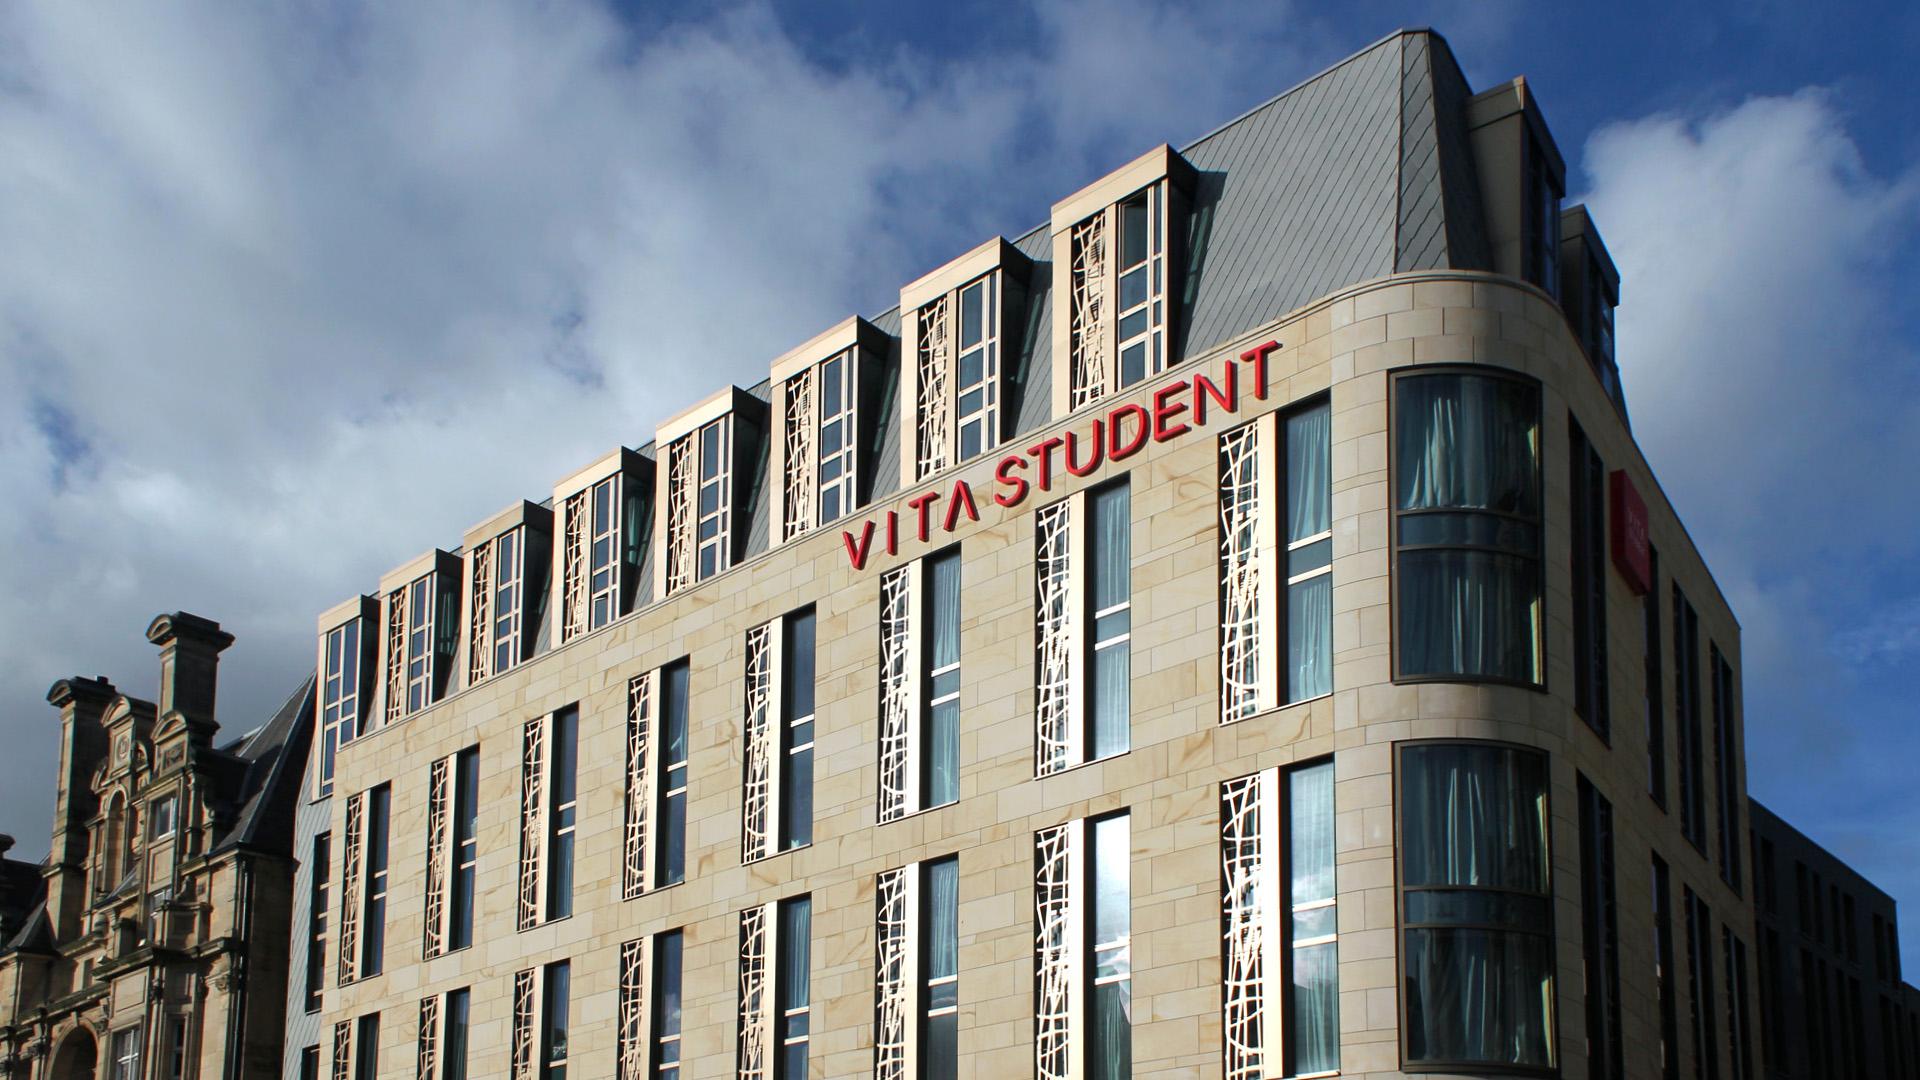 Vita Student Newcastle Upon Tyne Fuse Studios Limited